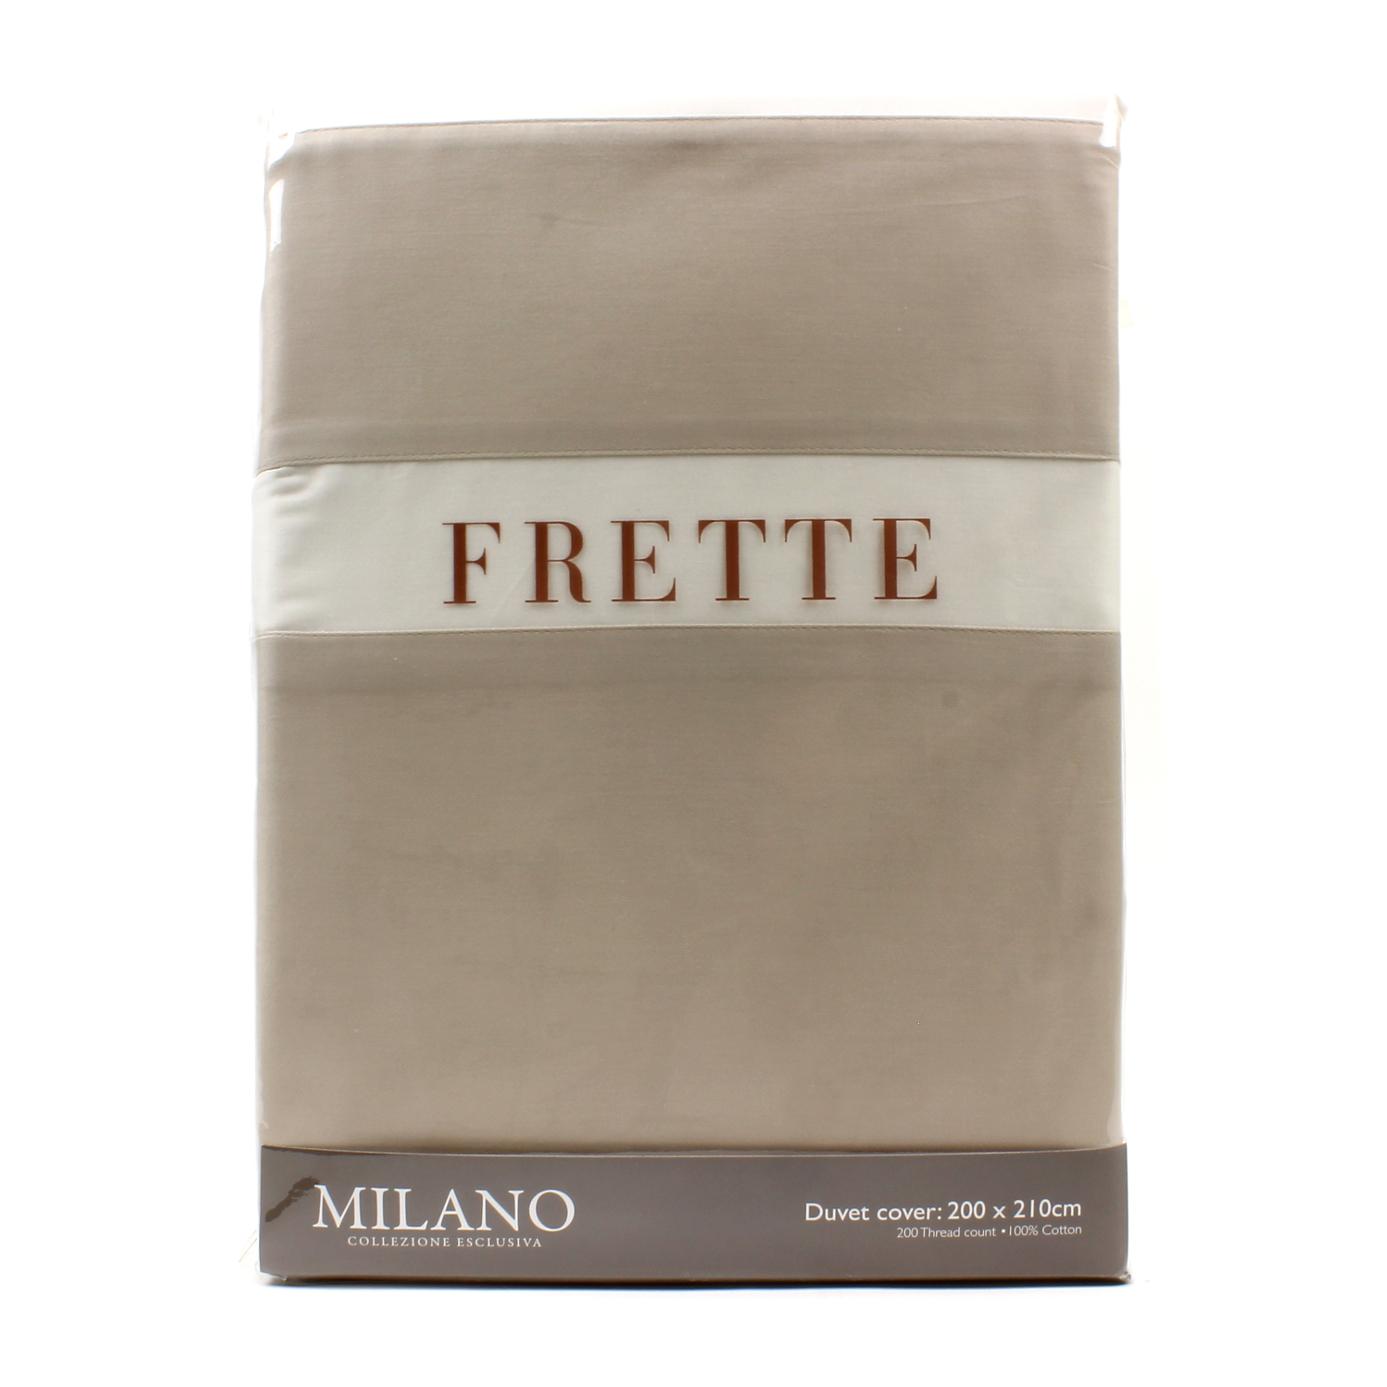 Duvet cover set milano frette cream tan cotton double bed for Frette milano